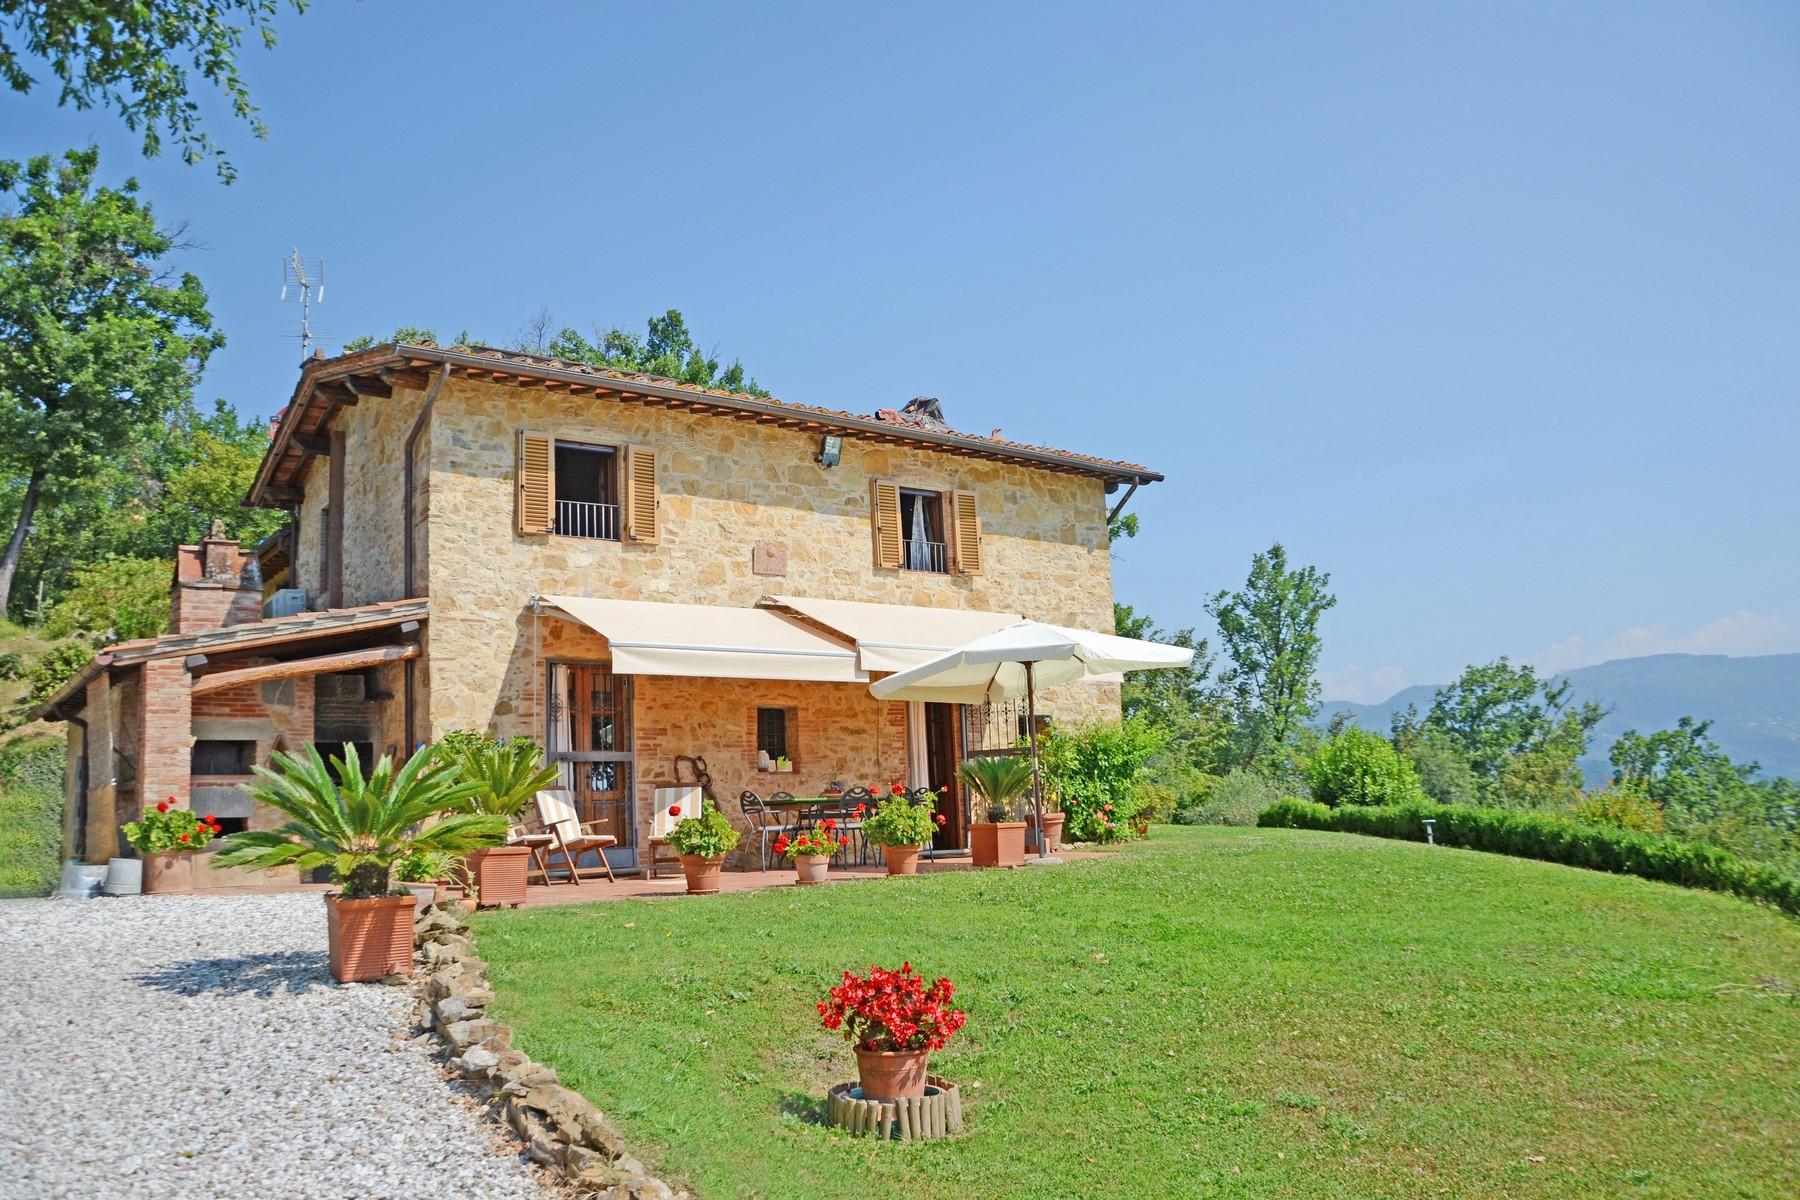 Rustico in Vendita a Lucca: 5 locali, 210 mq